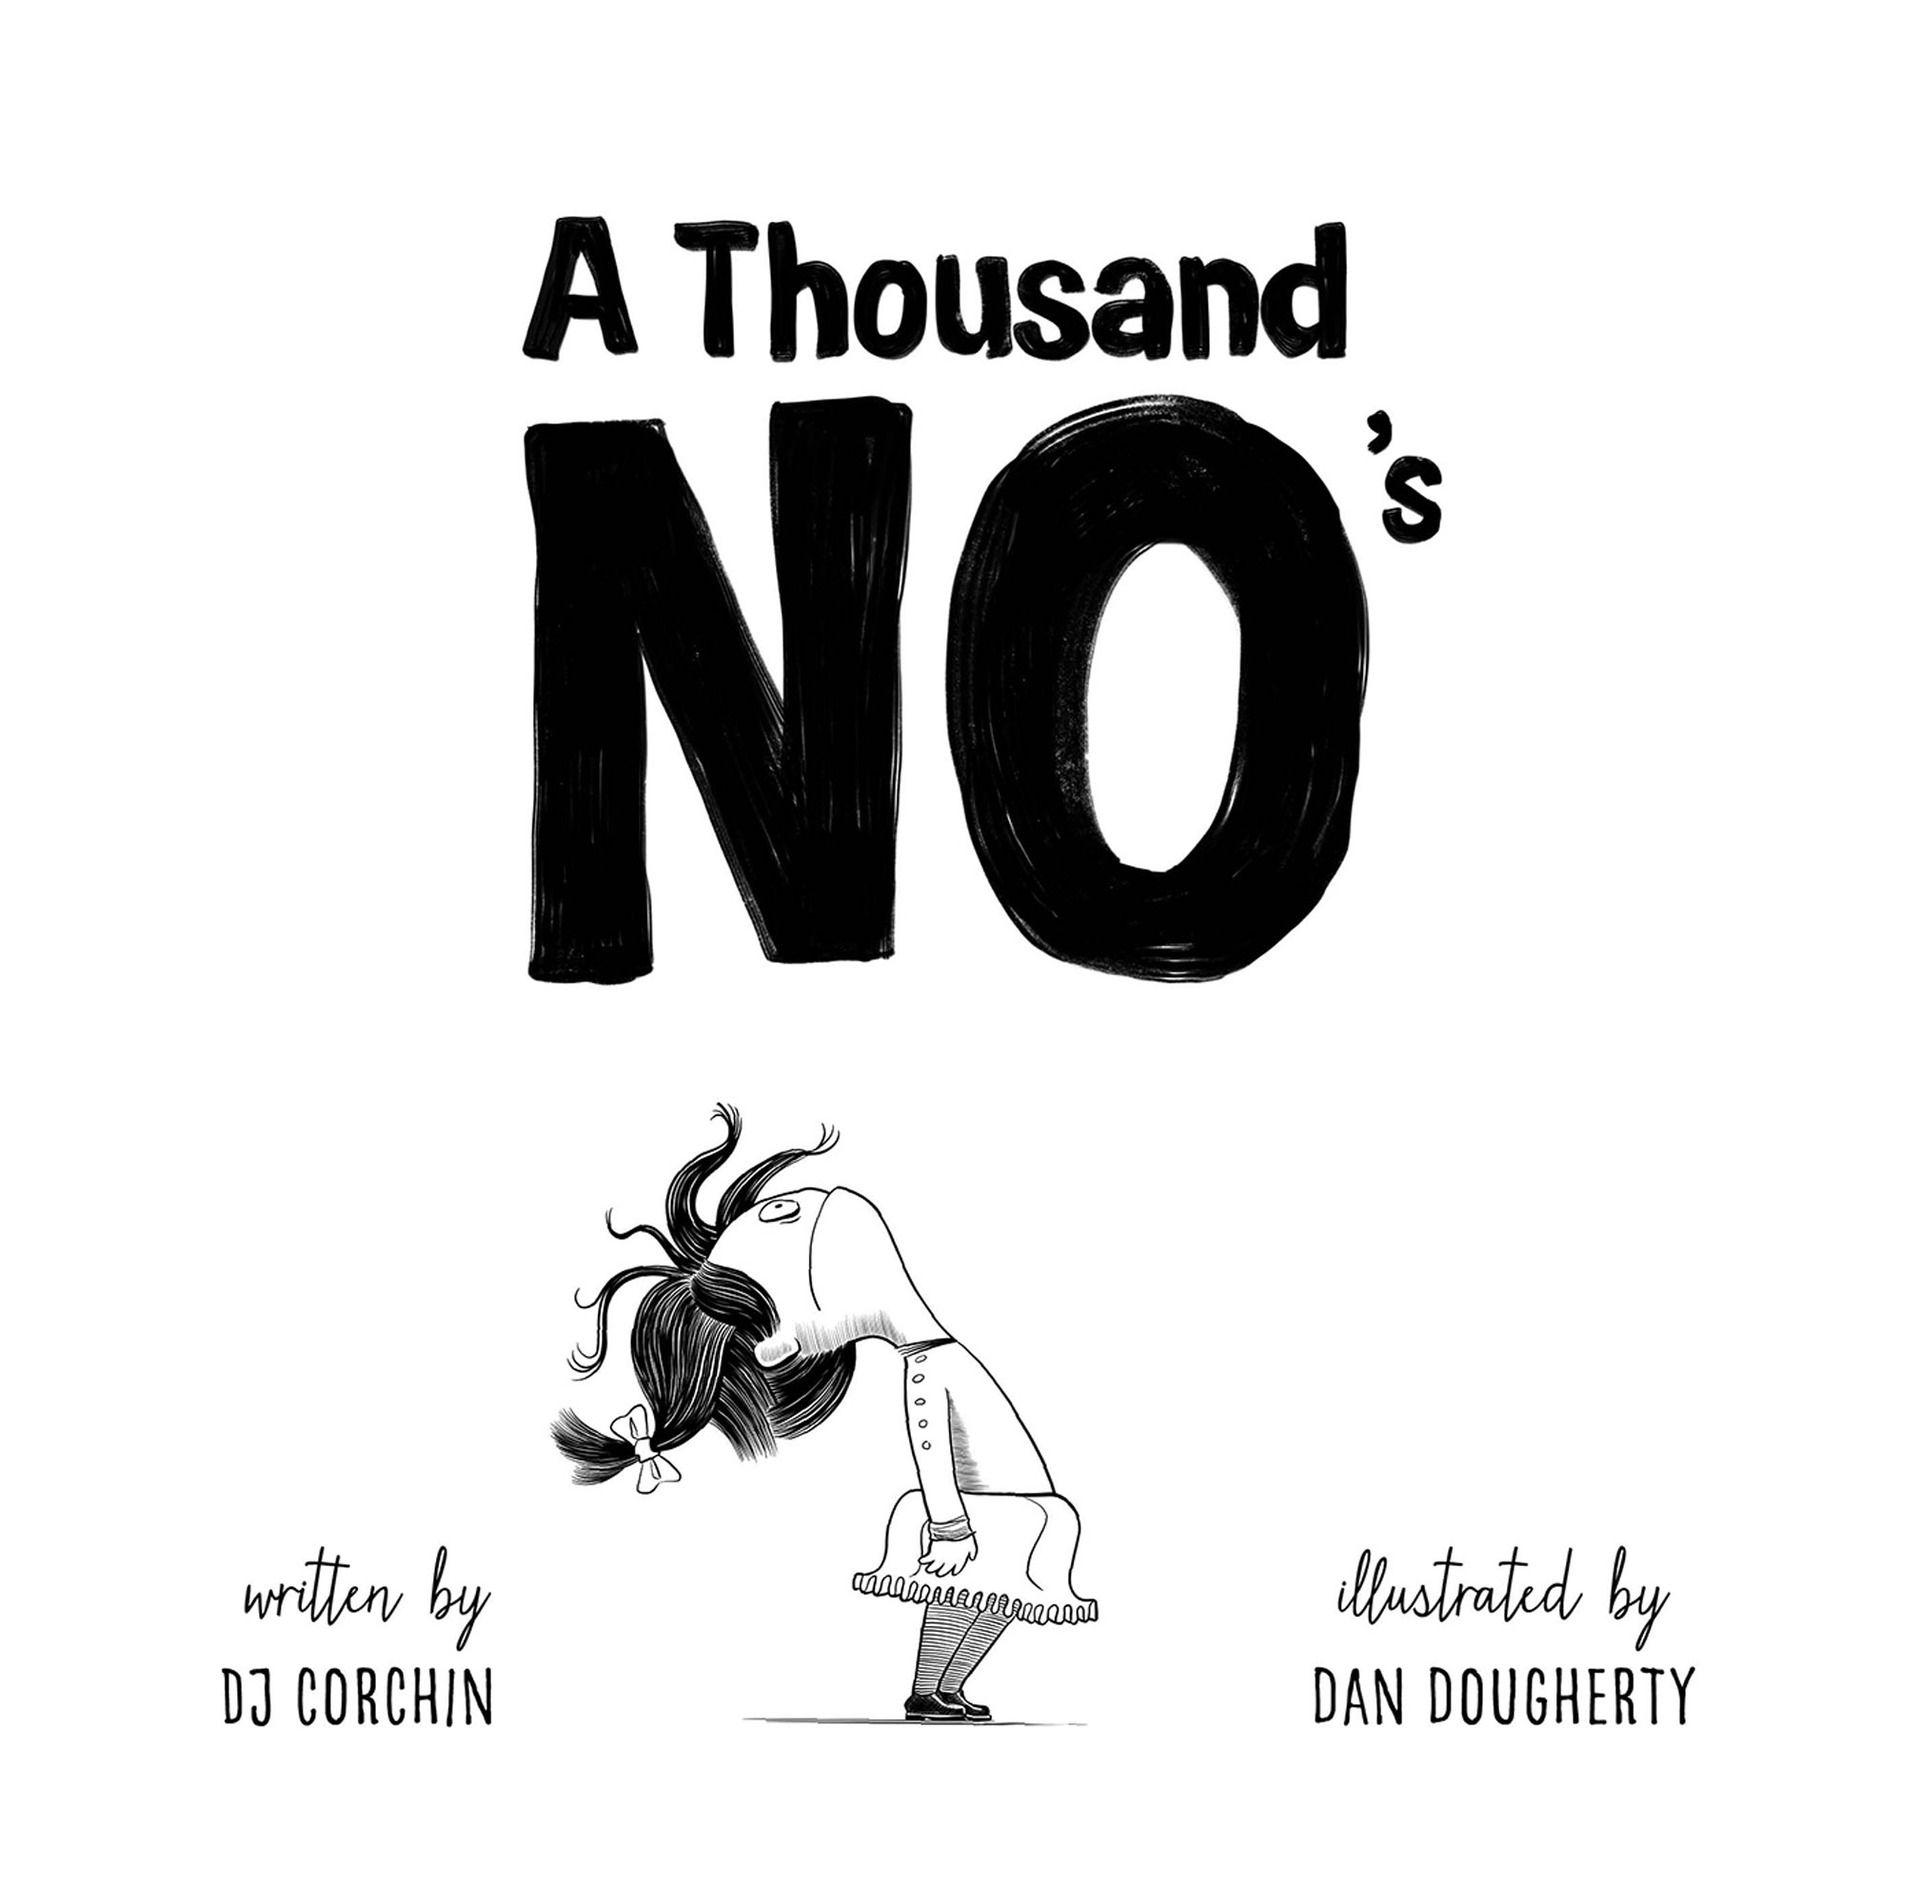 Free Amazon Promo Code 2020 for A Thousand Nos Hardcover